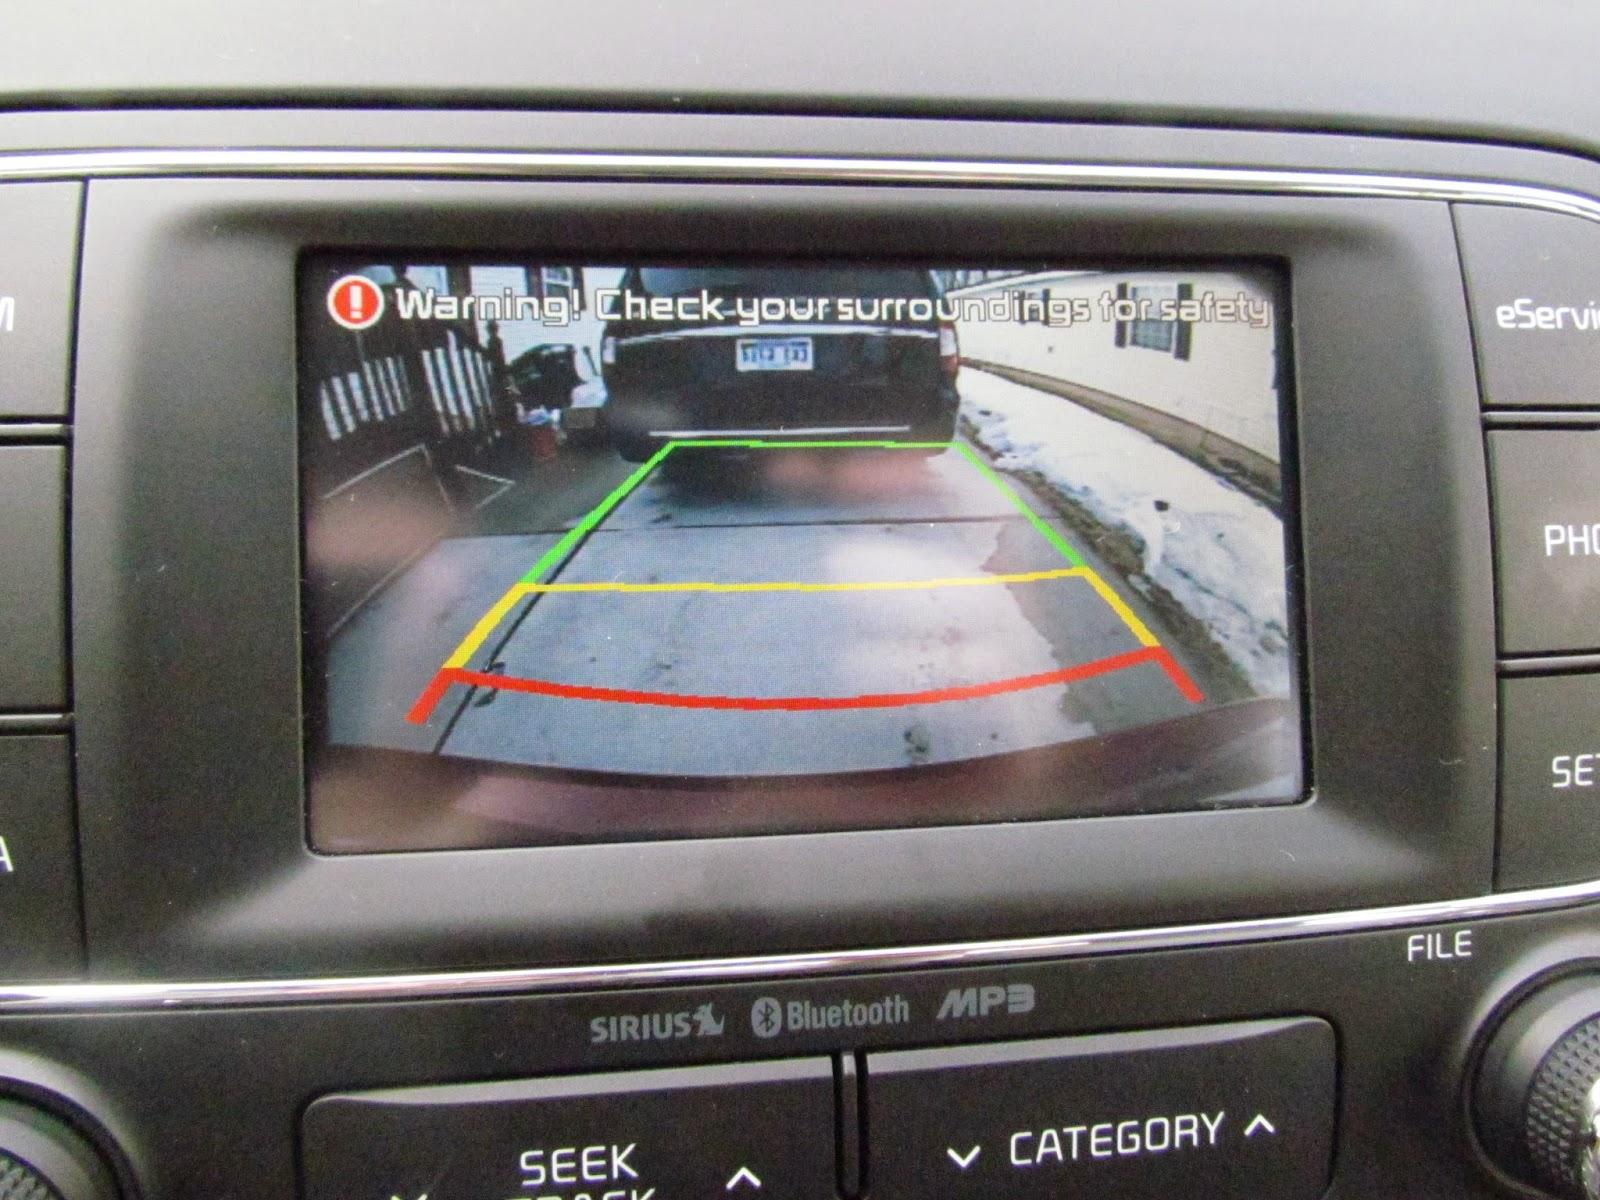 Kia Forte: Rearview camera